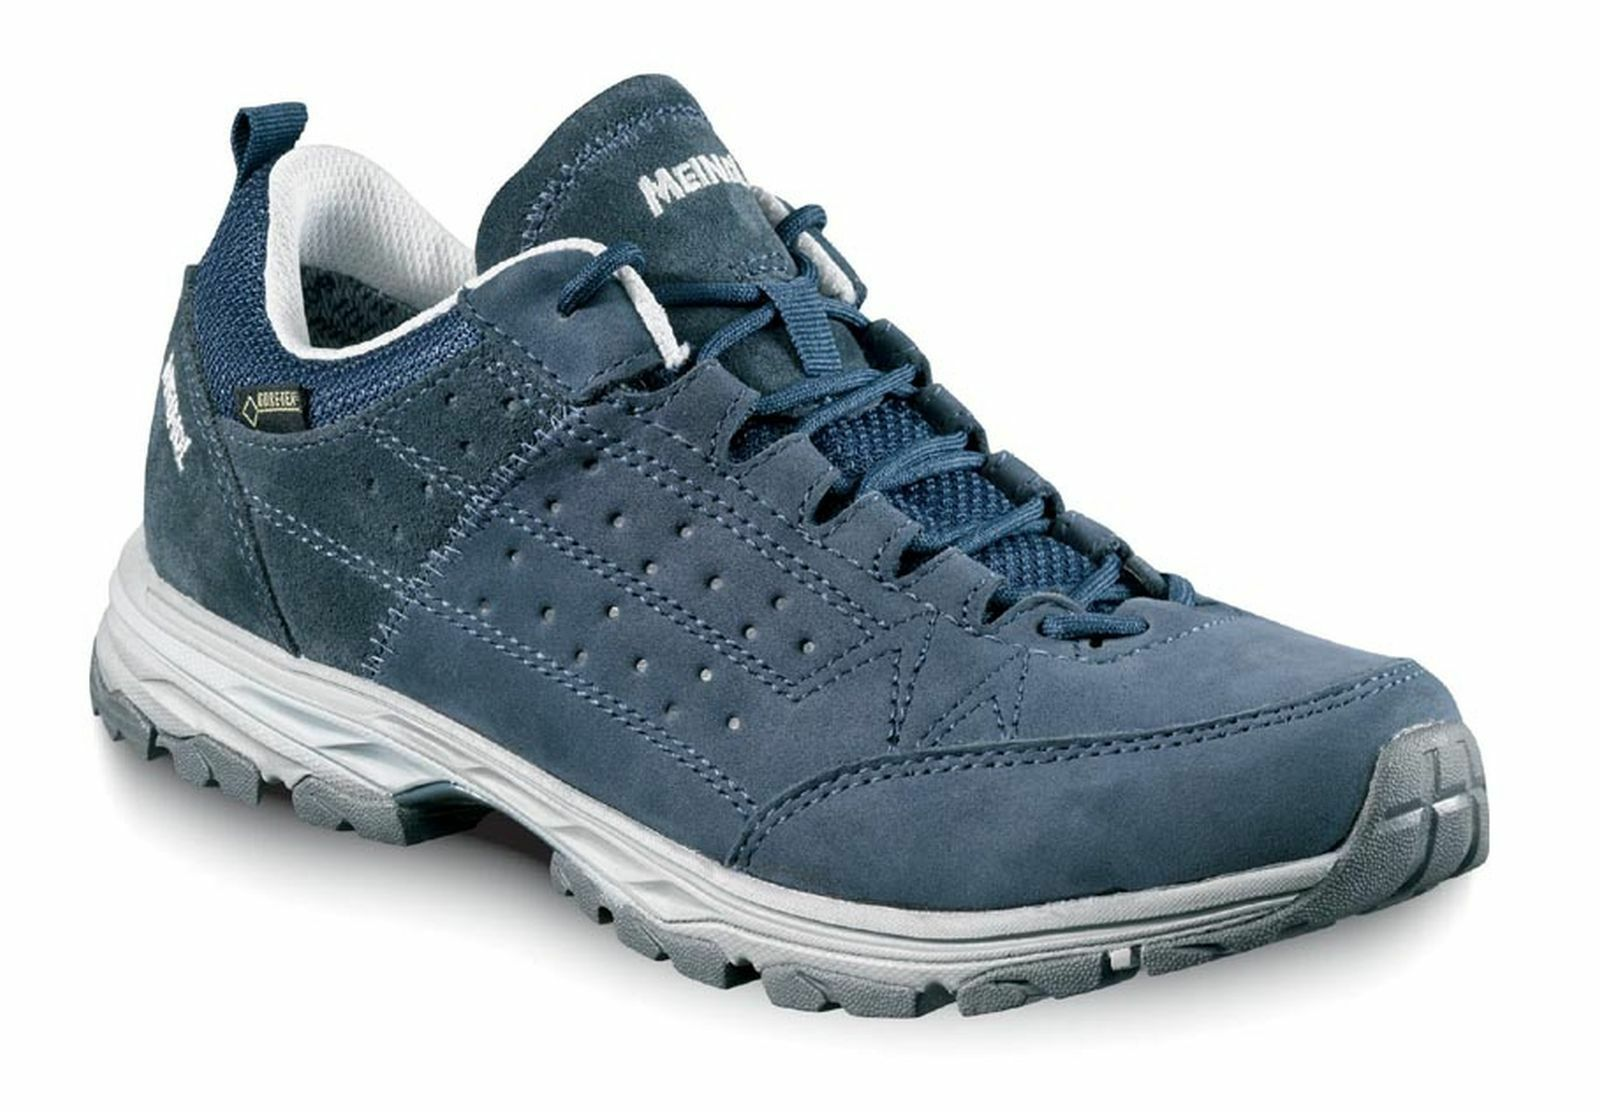 Moda barata y hermosa Meindl señora trekking zapato durban Lady GTX low Marine